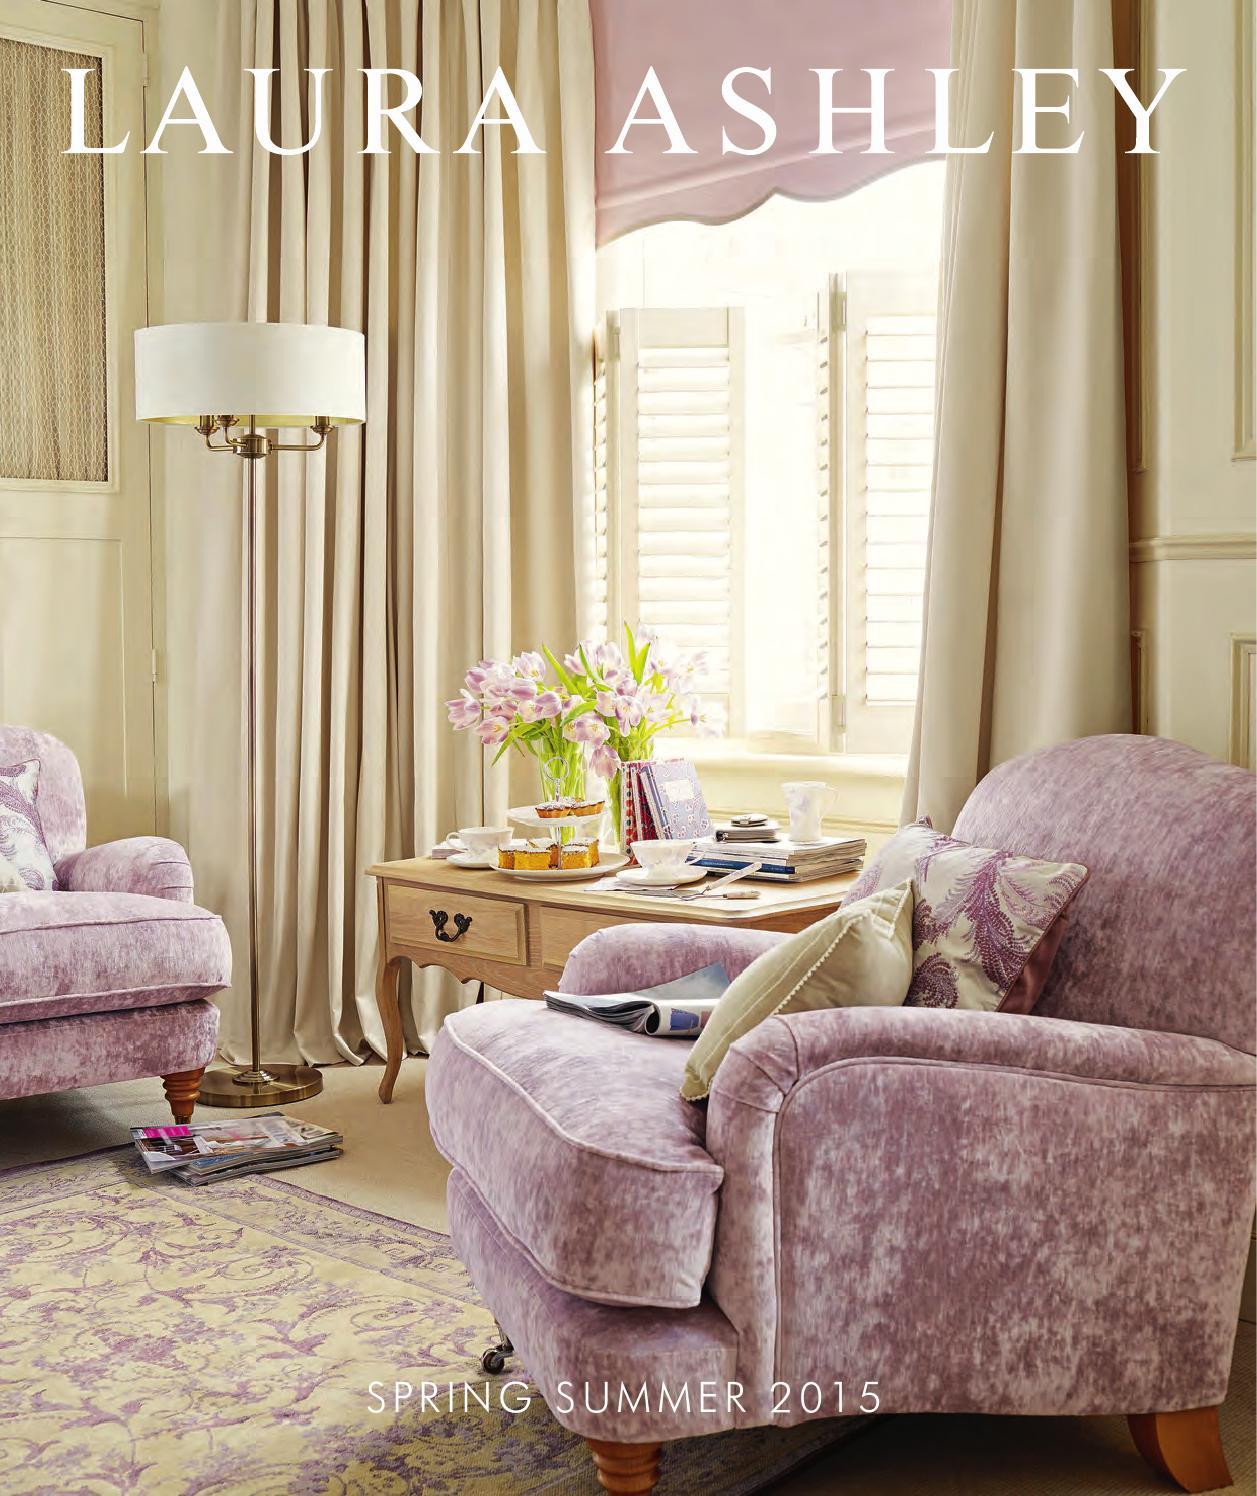 Laura Ashley Home Spring Summer 2015 By Laura Ashley